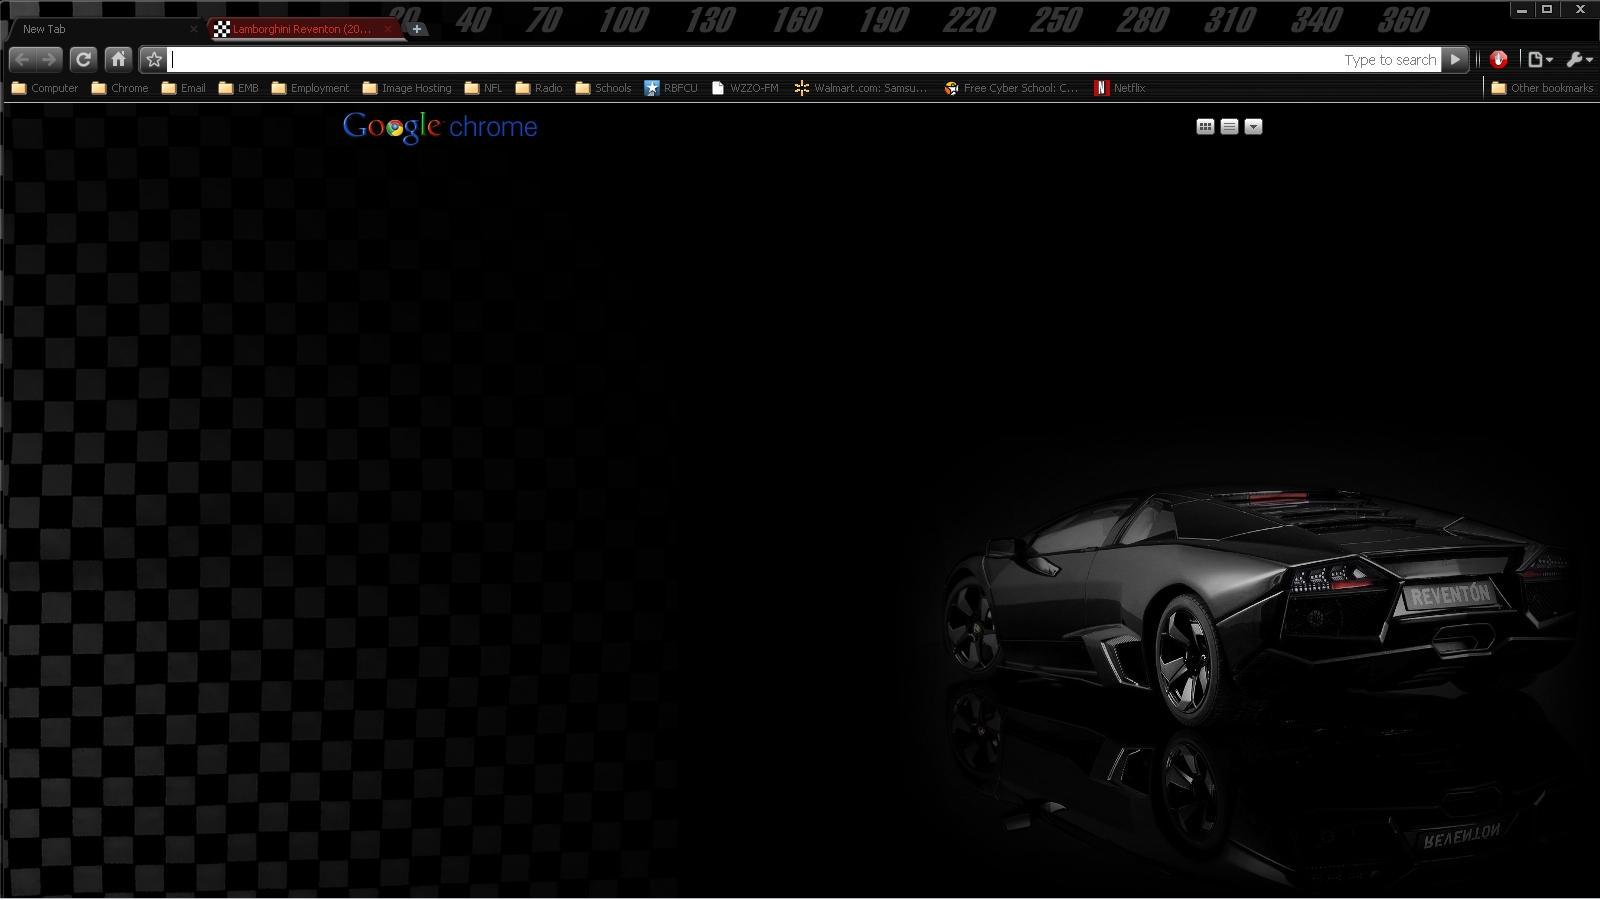 Google chrome themes in black - Google Themes Lamborghini Google Themes Lamborghini 18